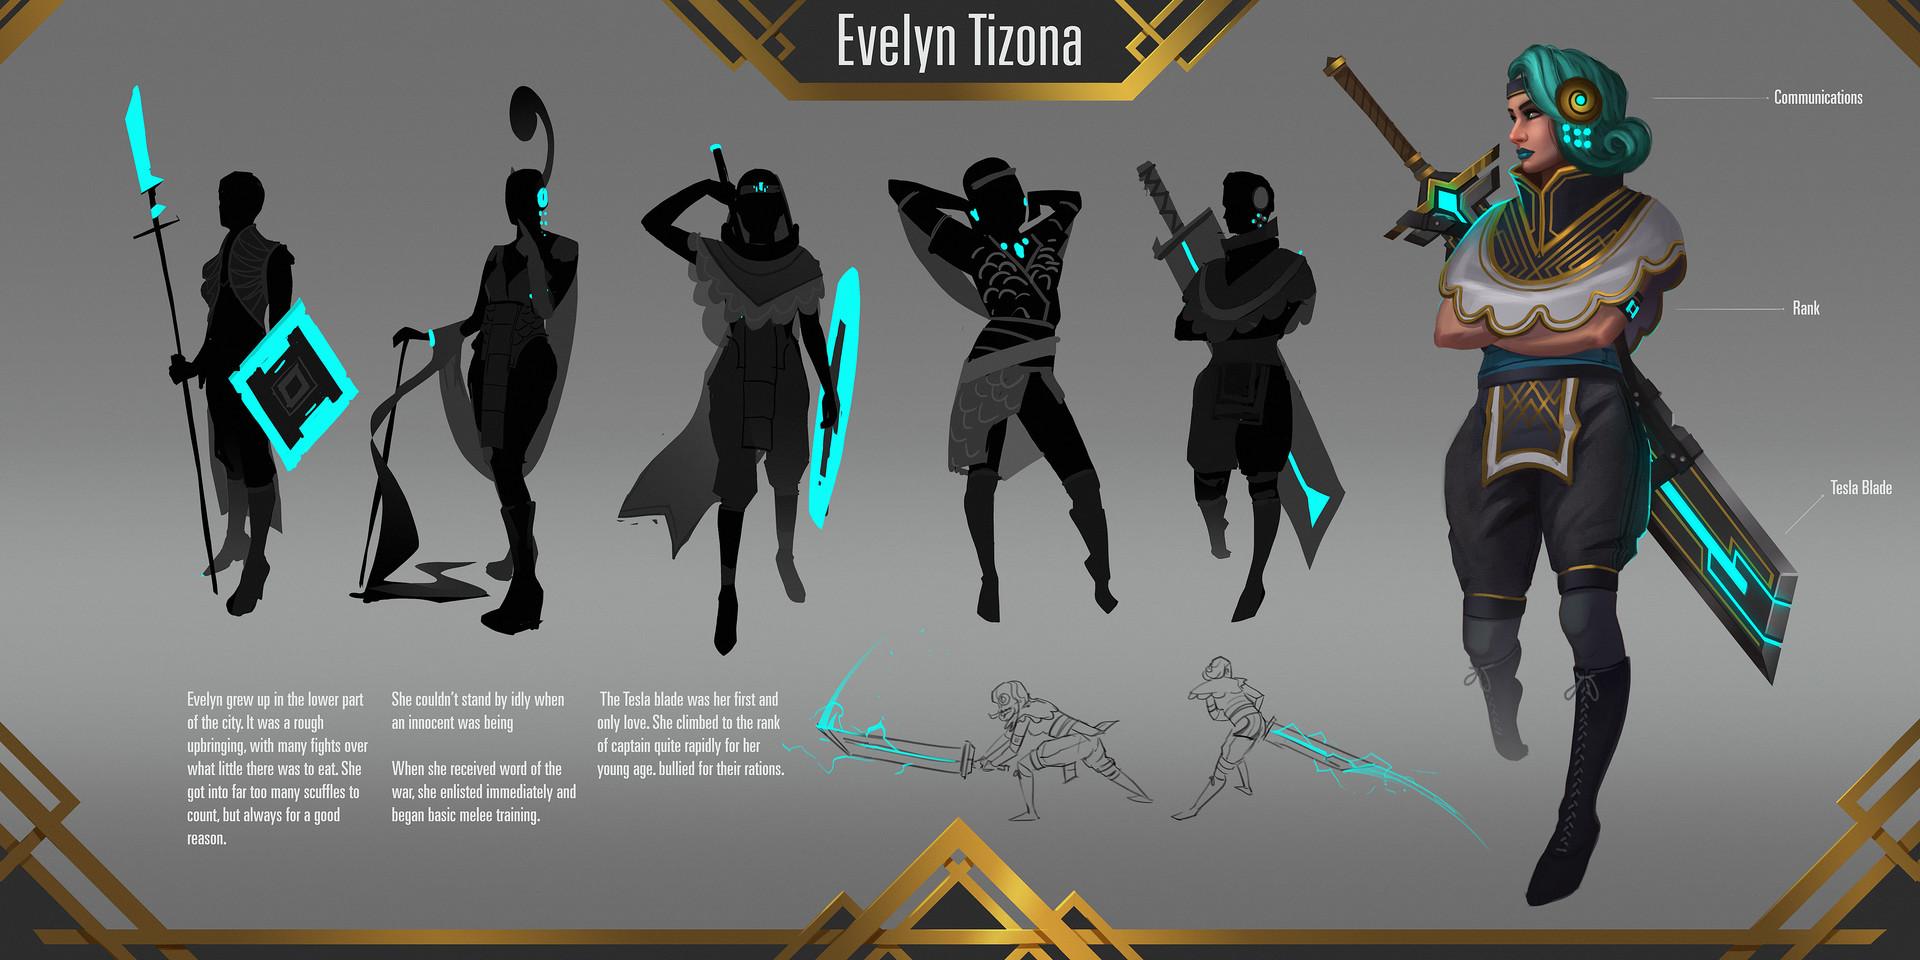 Tim kaminski character evelyn tizona